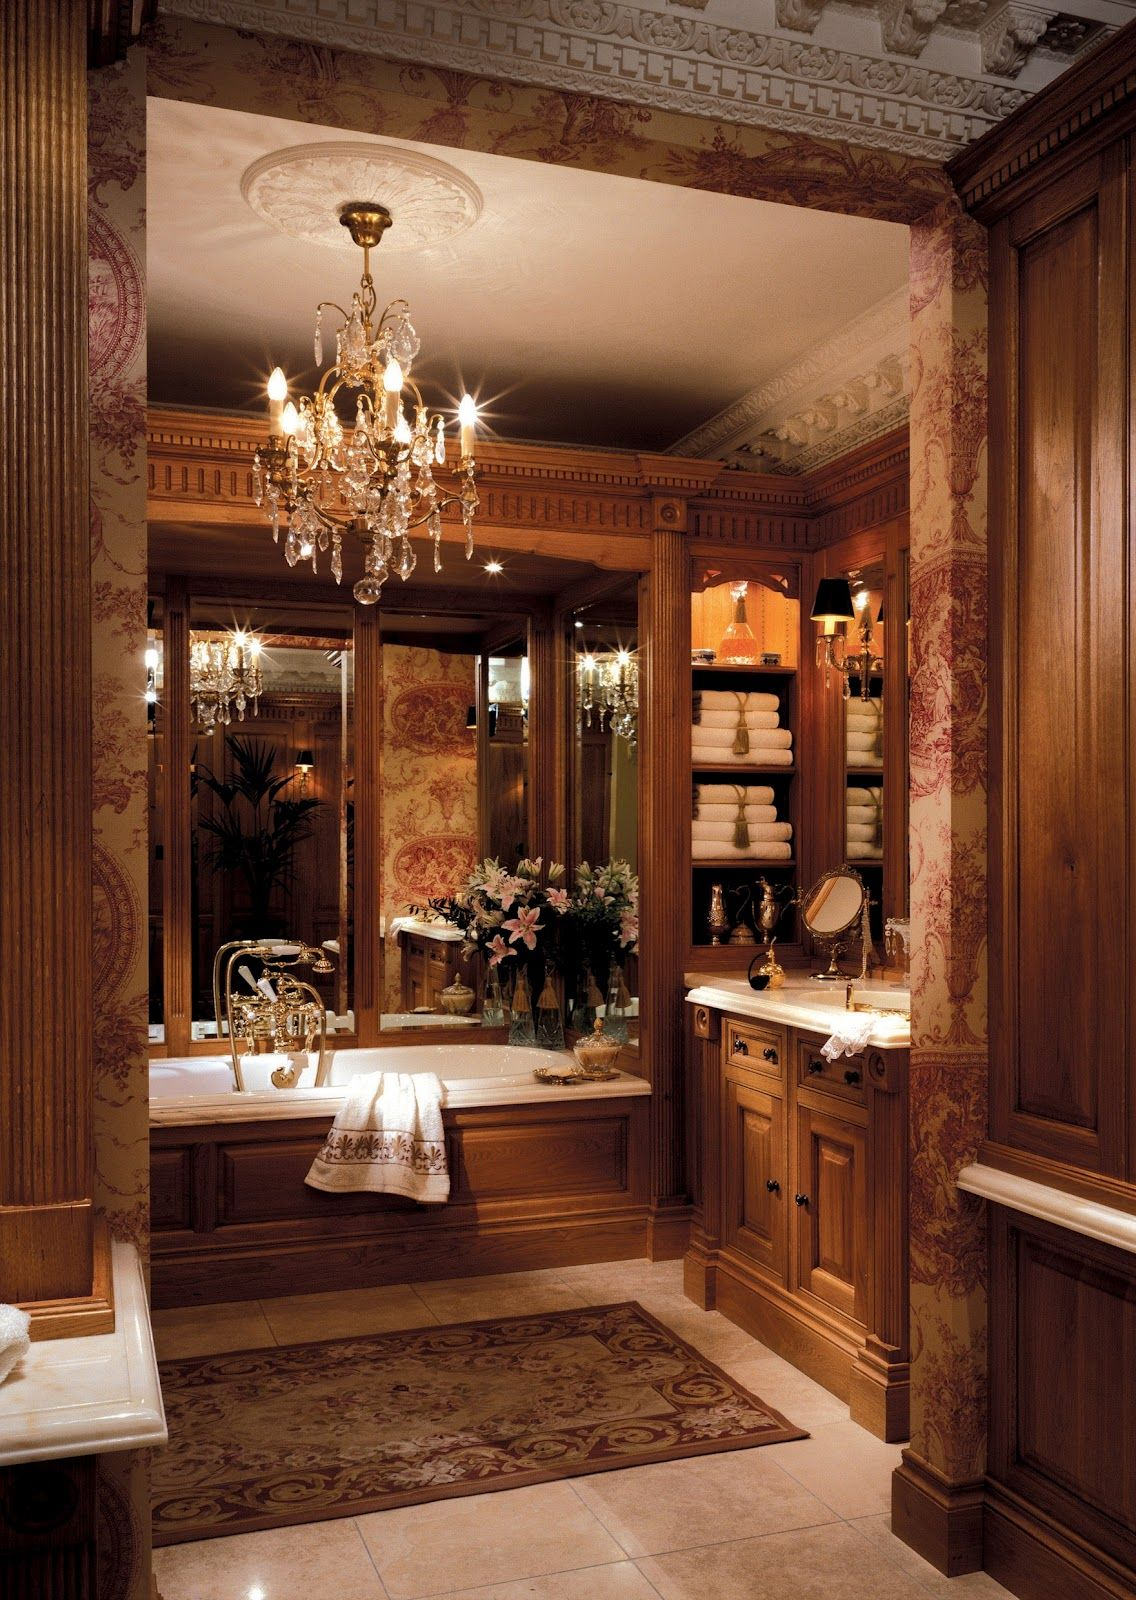 Intelligent Homes | Beautiful bathrooms, Dream bathrooms